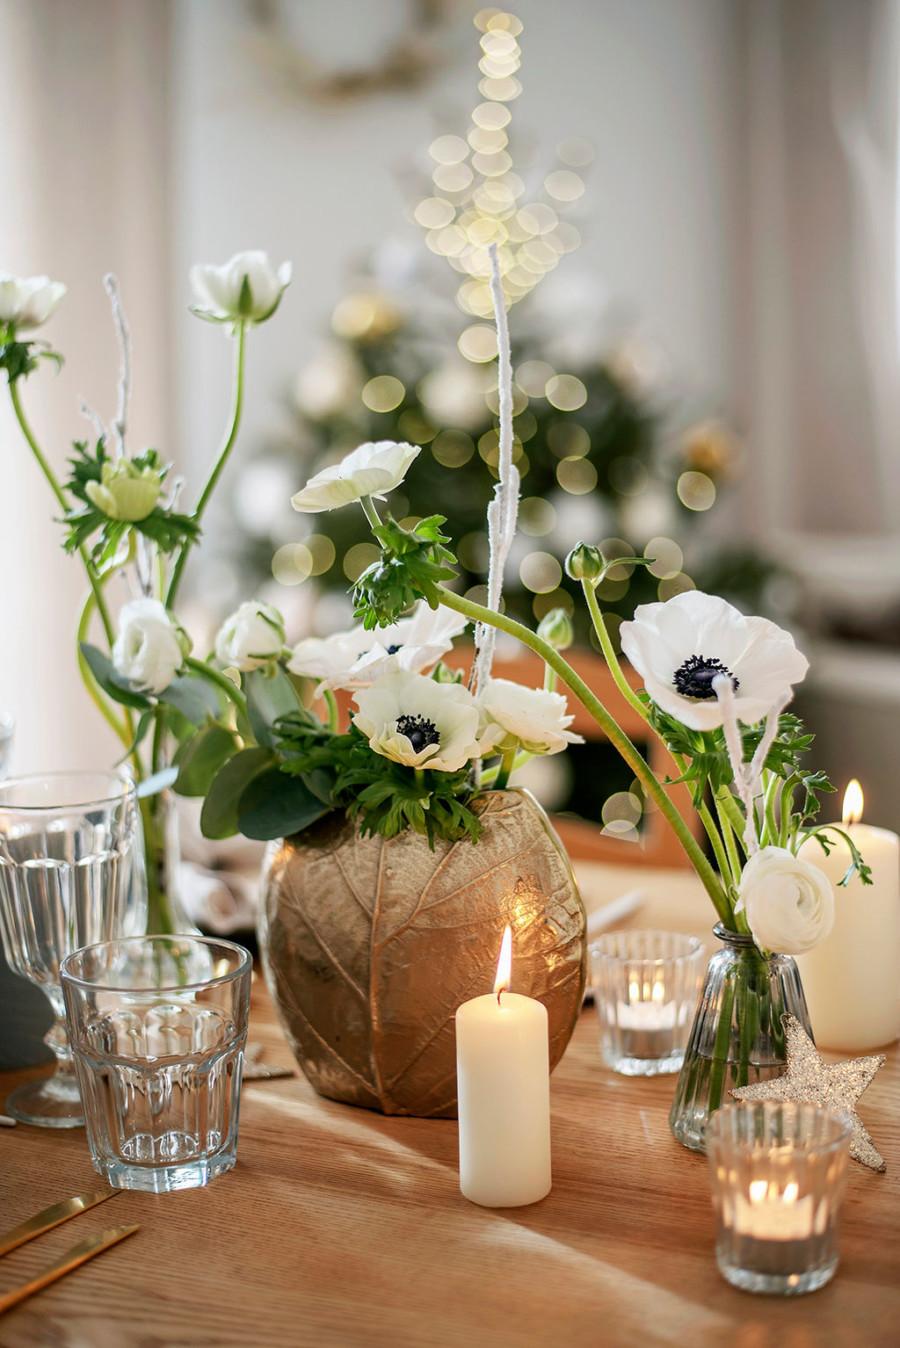 christmas challenge 2020 challenge noel deco table noel noel tendance noel couleur blanc or bois et sapin